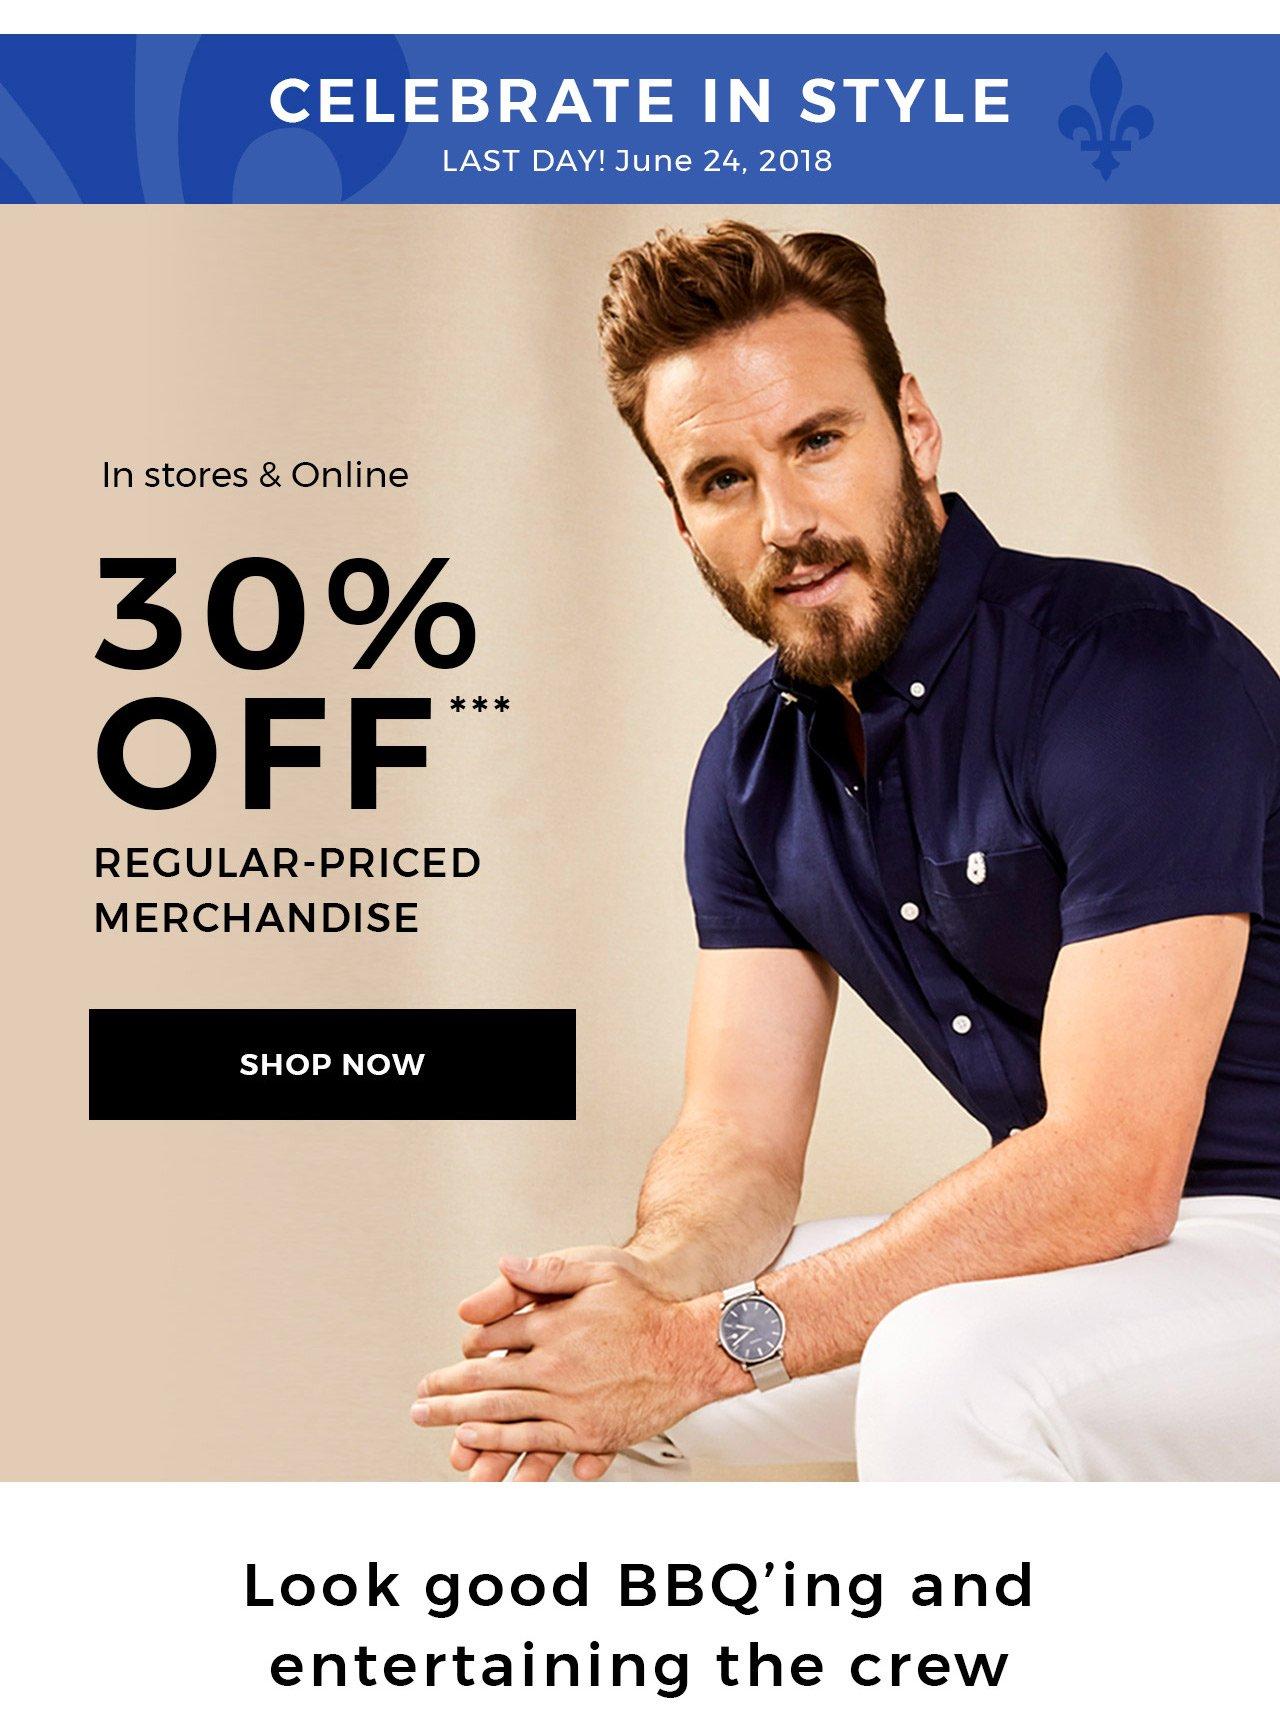 30% off regular-priced merchandise